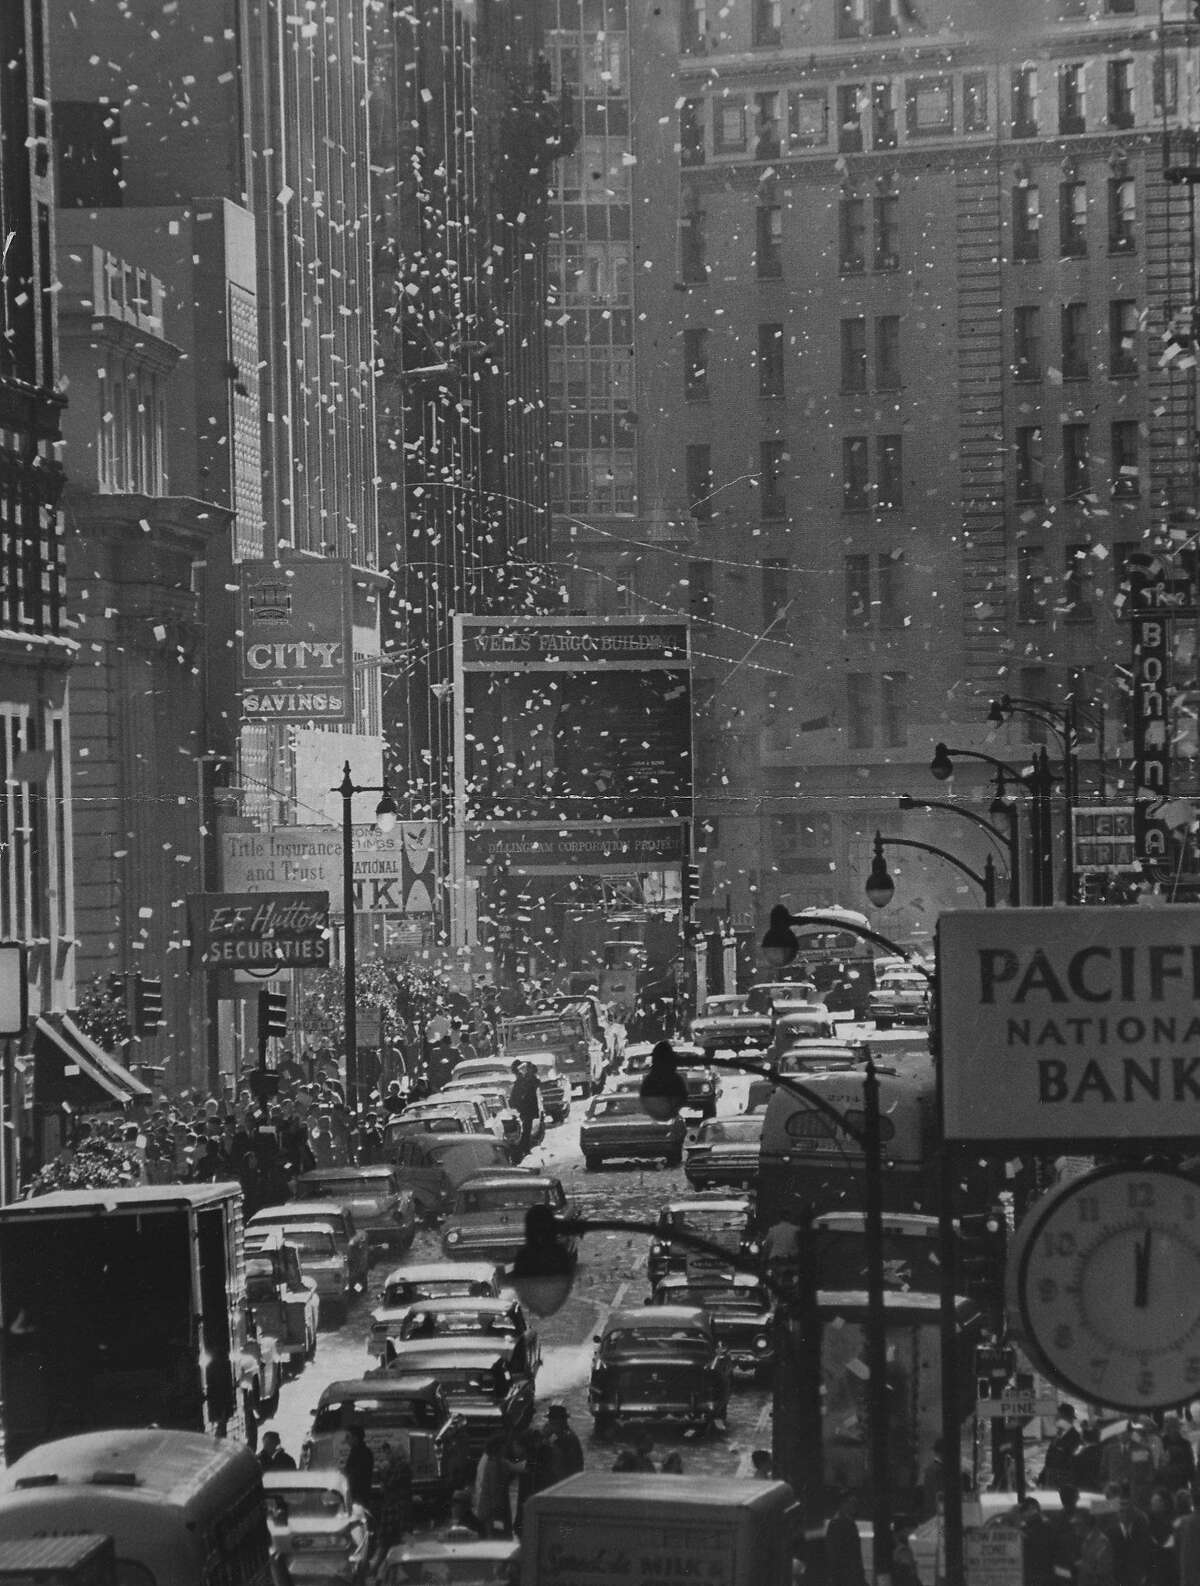 It's raining calendar books on New Year's Eve in San Francisco on December 31, 1964.